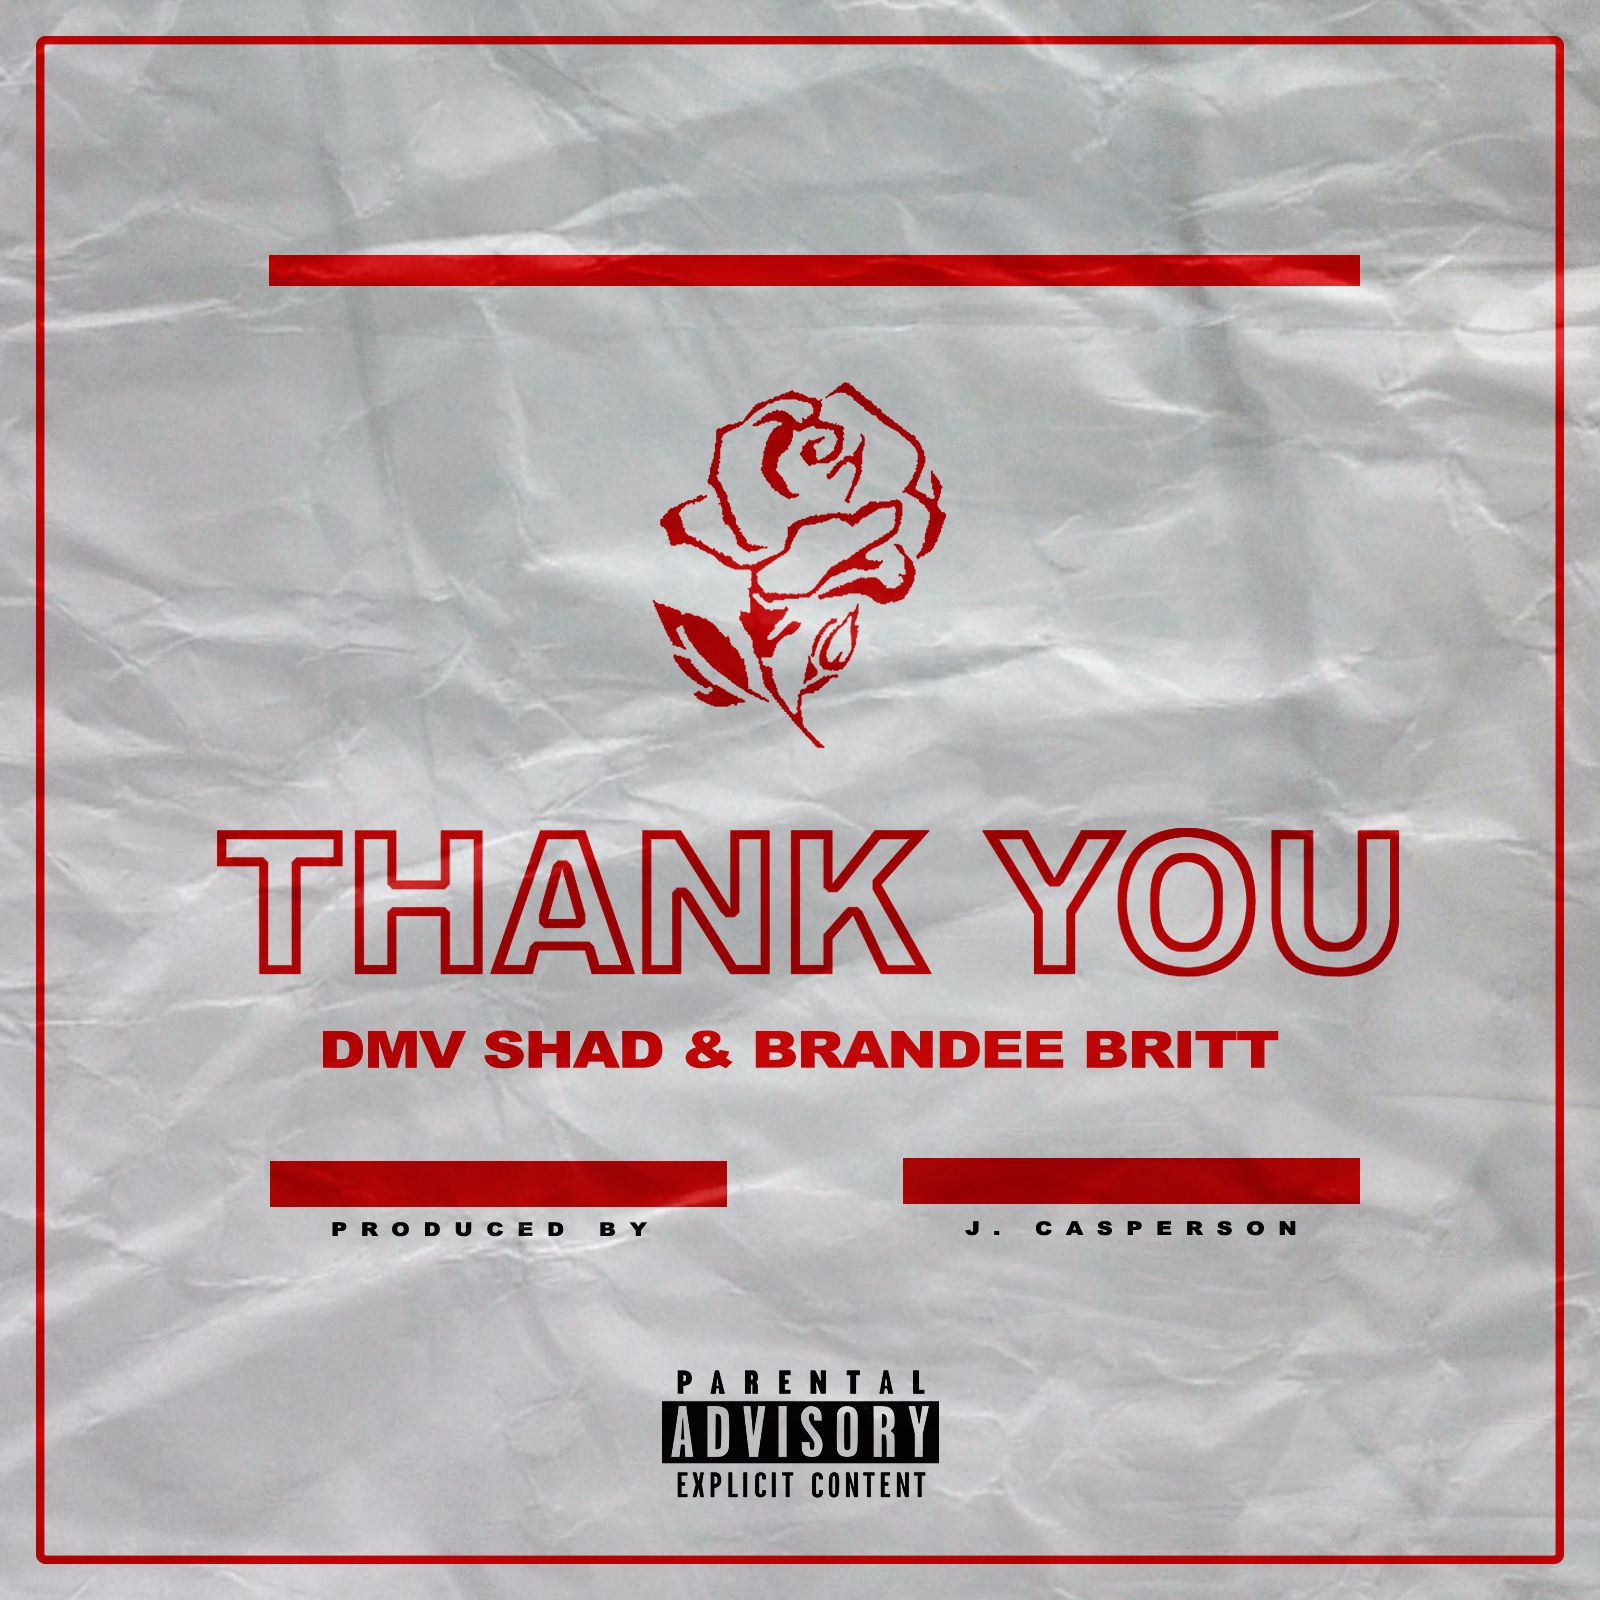 DMV Shad & Brandee Britt